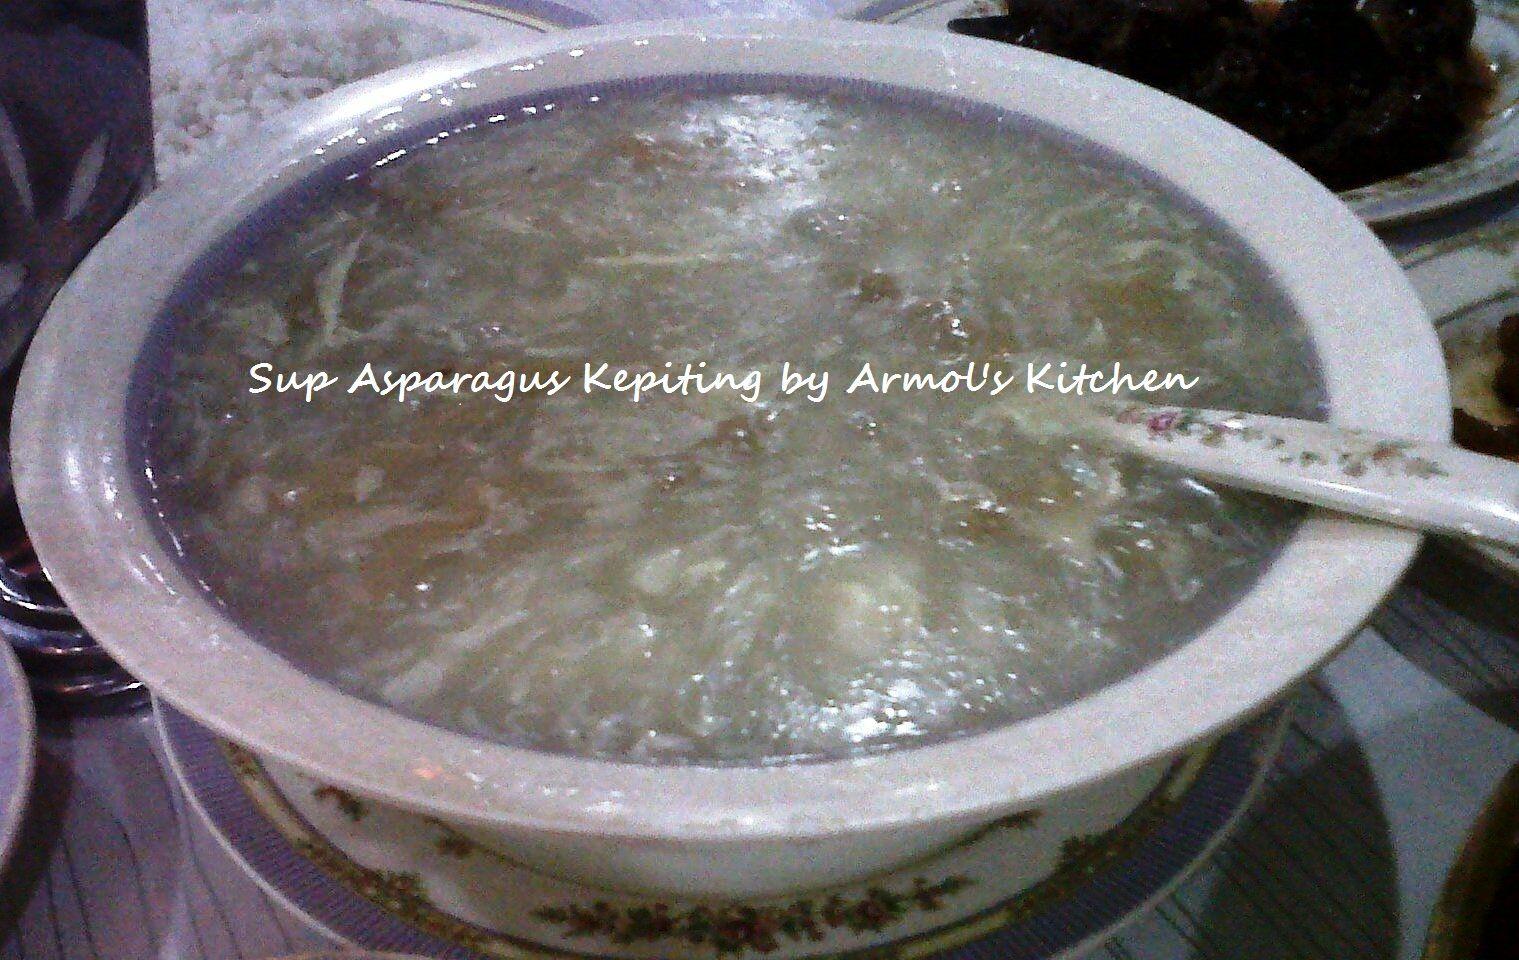 Sup Asparagus Kepiting Yuk Simak Resepnya Http Aneka Resep Masakan Online Blogspot Co Id 2015 11 Resep Sup Asparagus Kepiting A Resep Sup Kepiting Asparagus